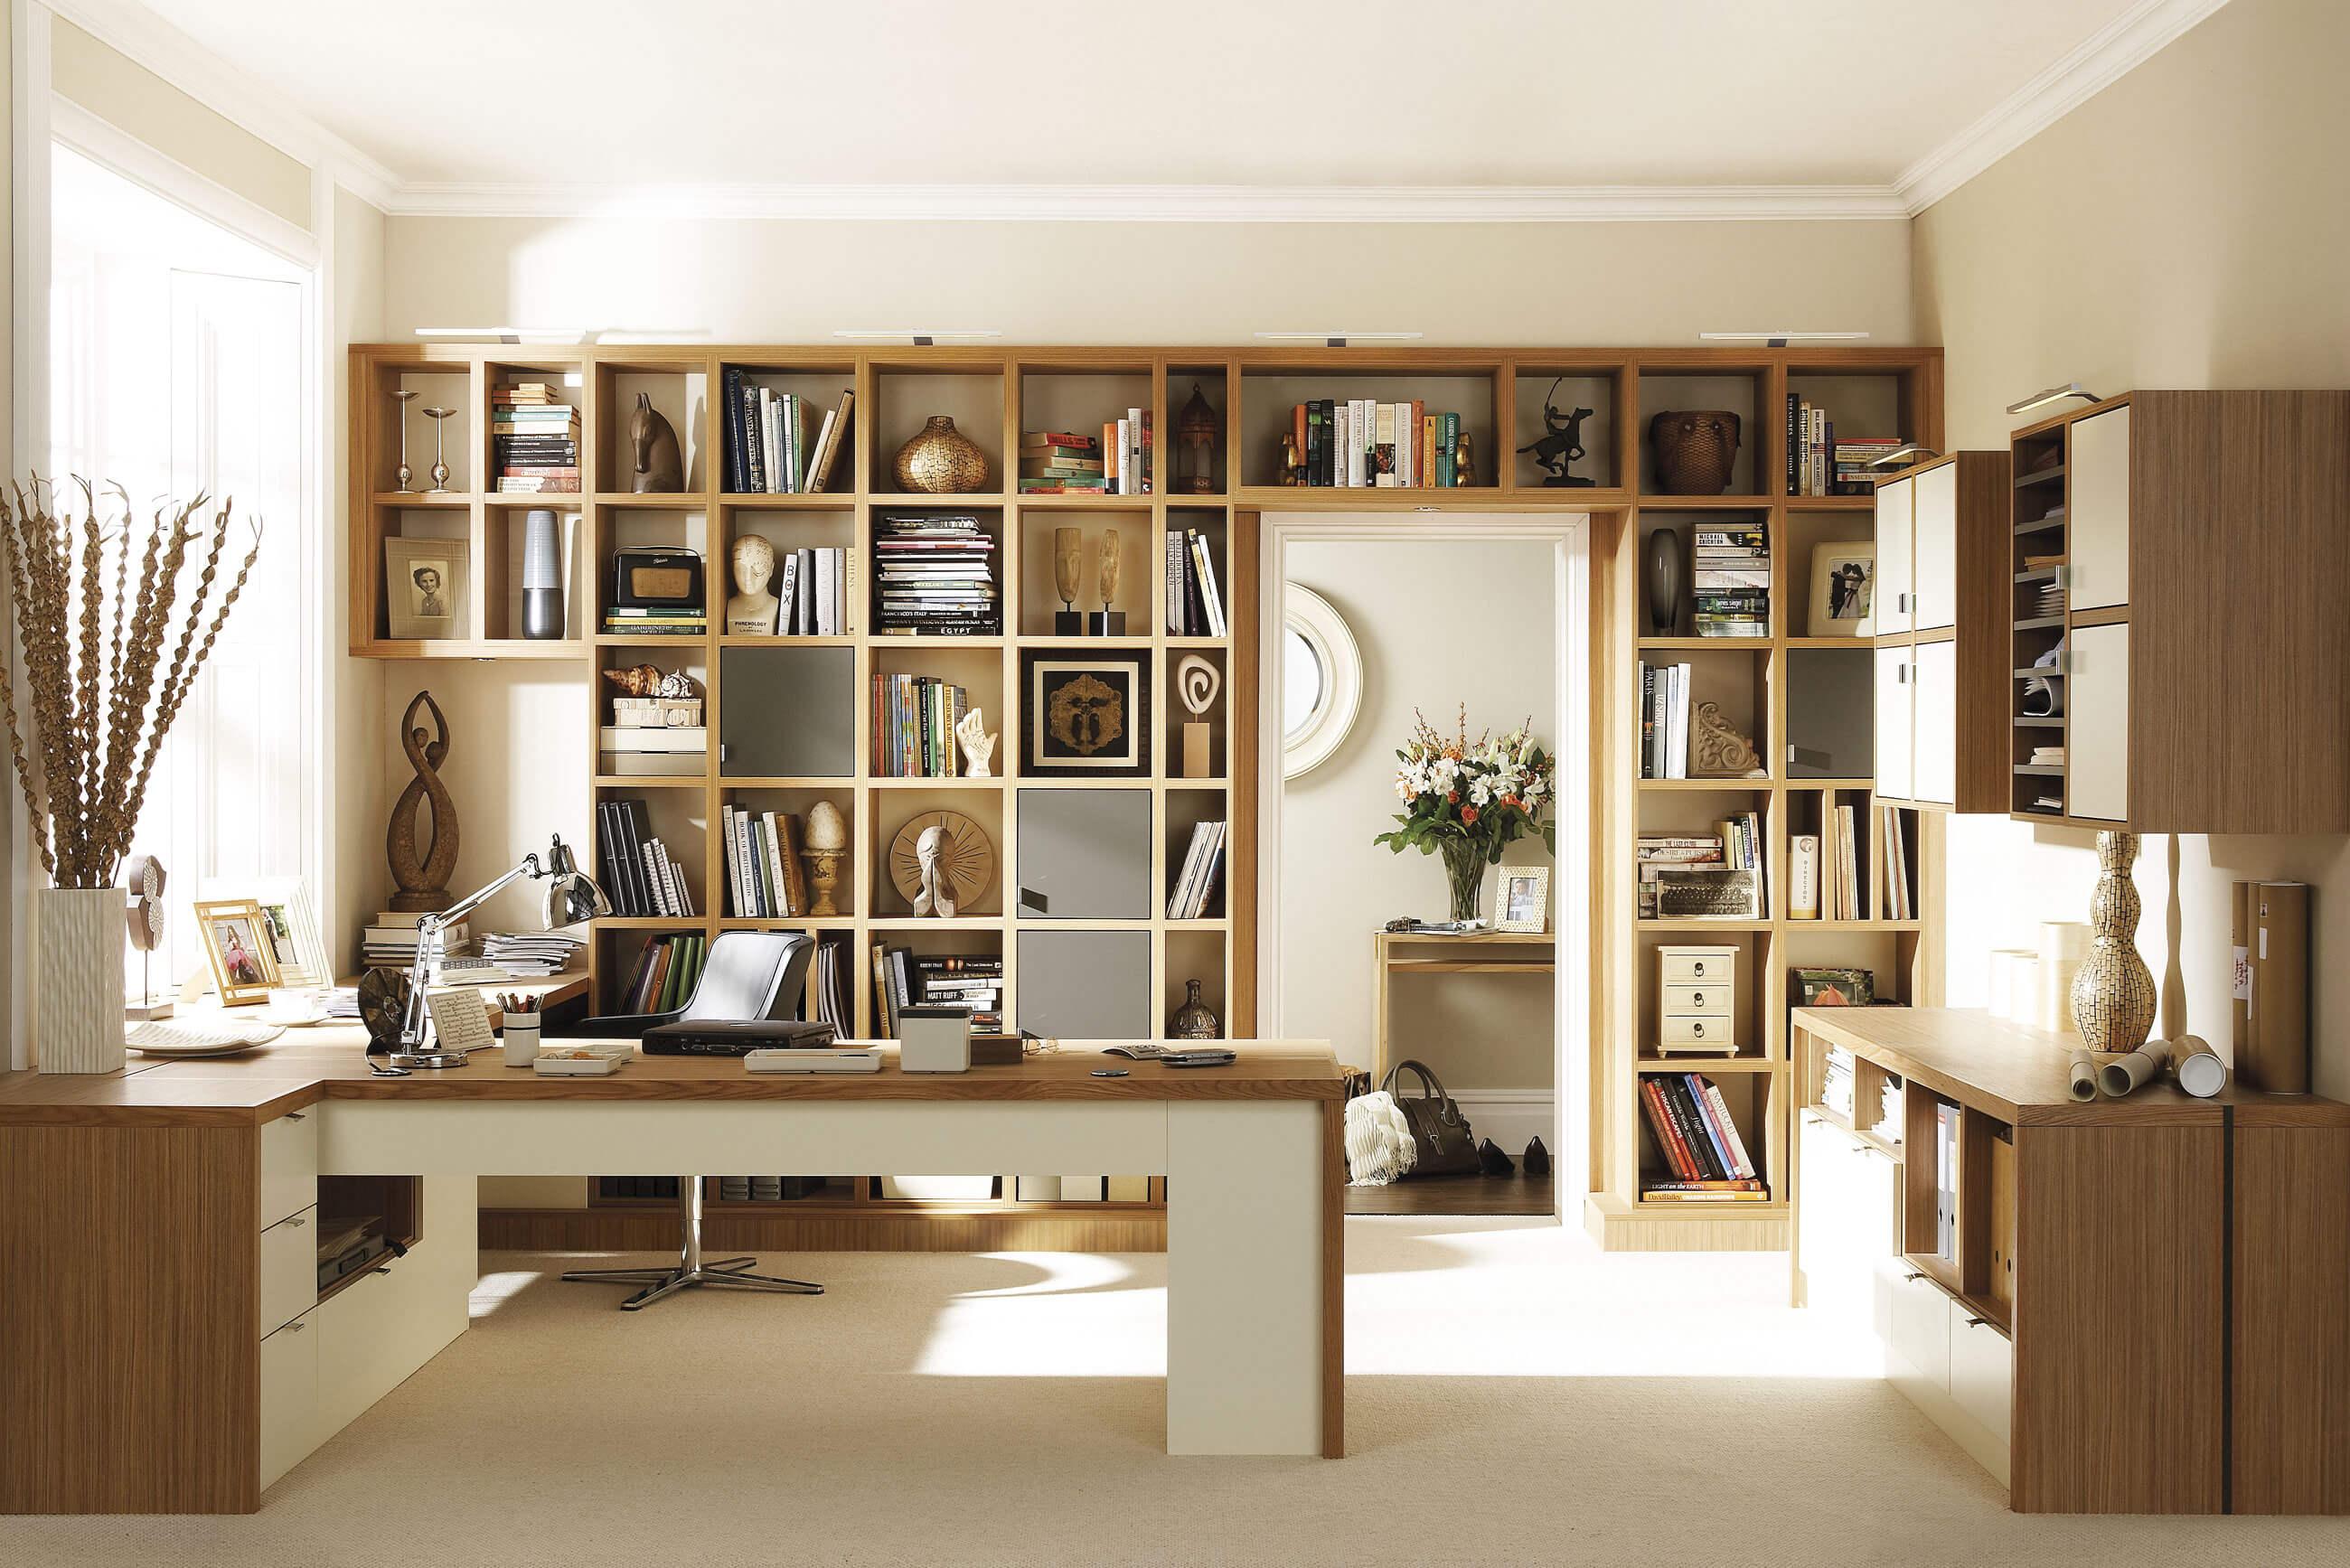 Study Furniture Design. Go To Previous Slide. Next View All Images Study Furniture  Design